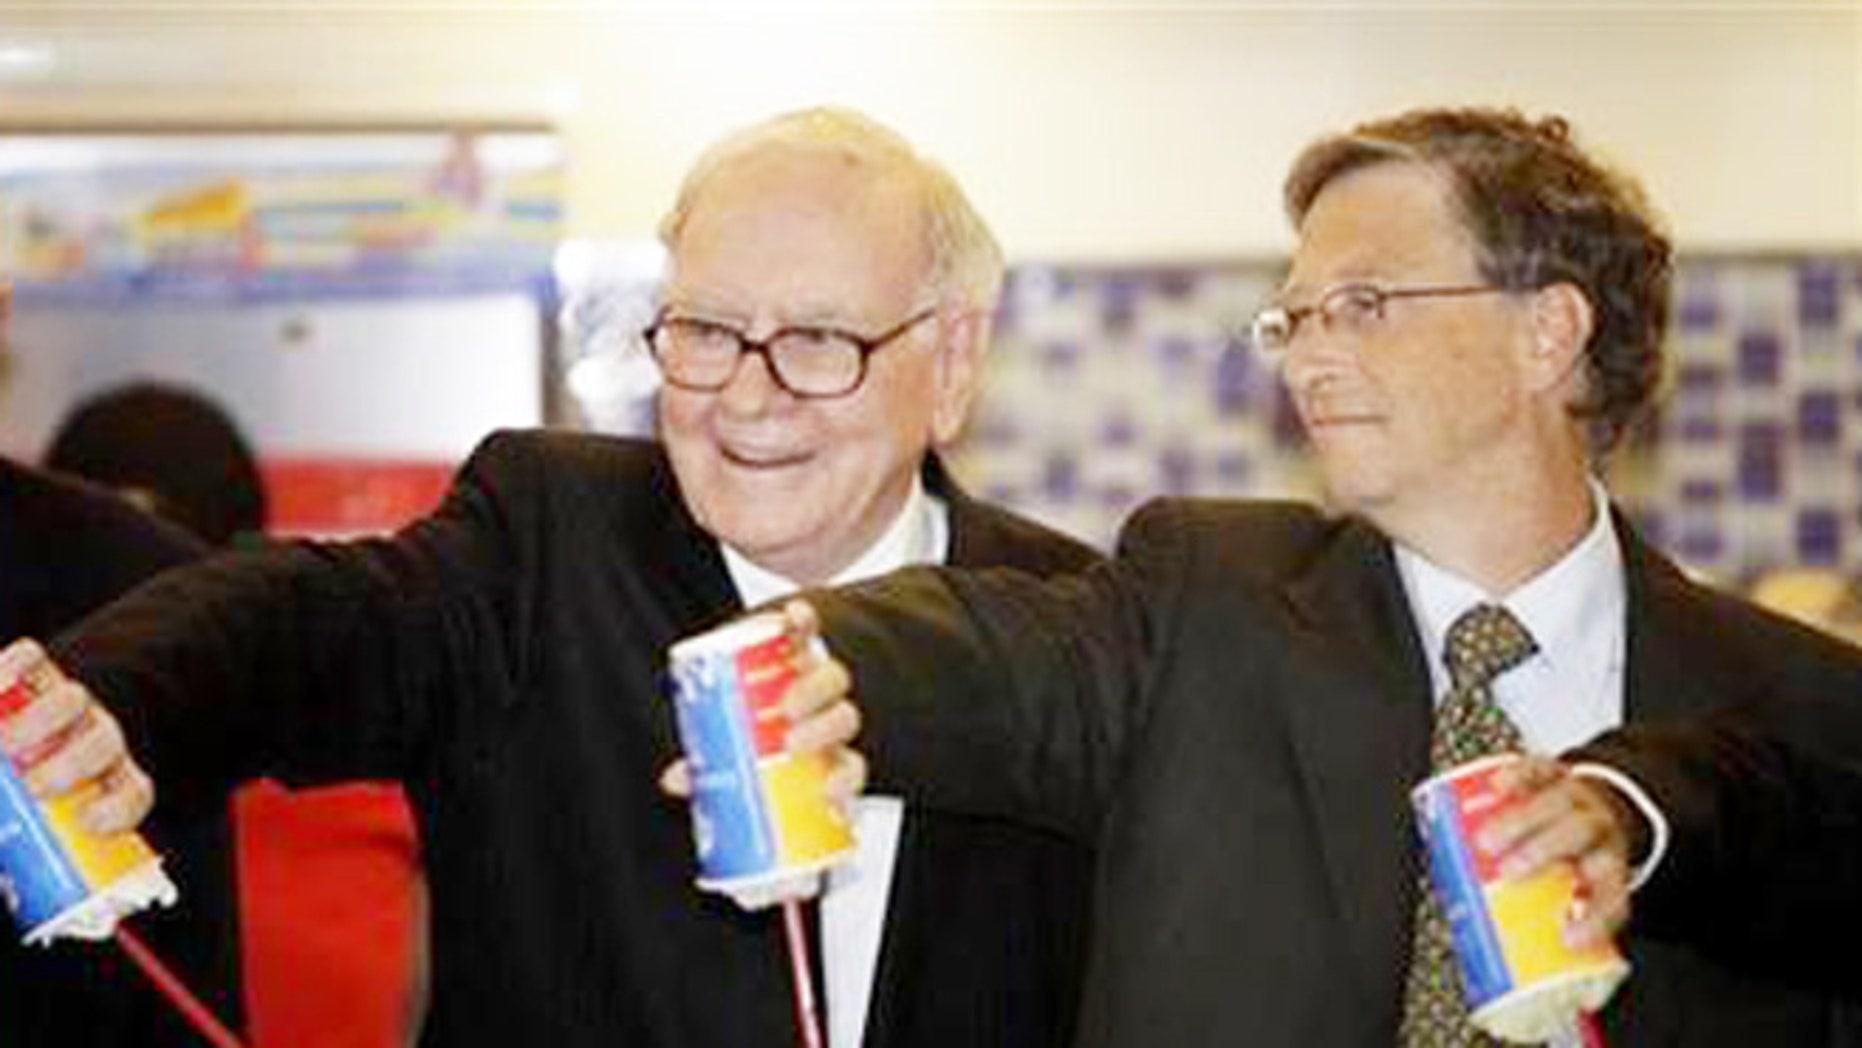 Warren Buffet (L) and Bill Gates test out Dairy Queen Blizzards.